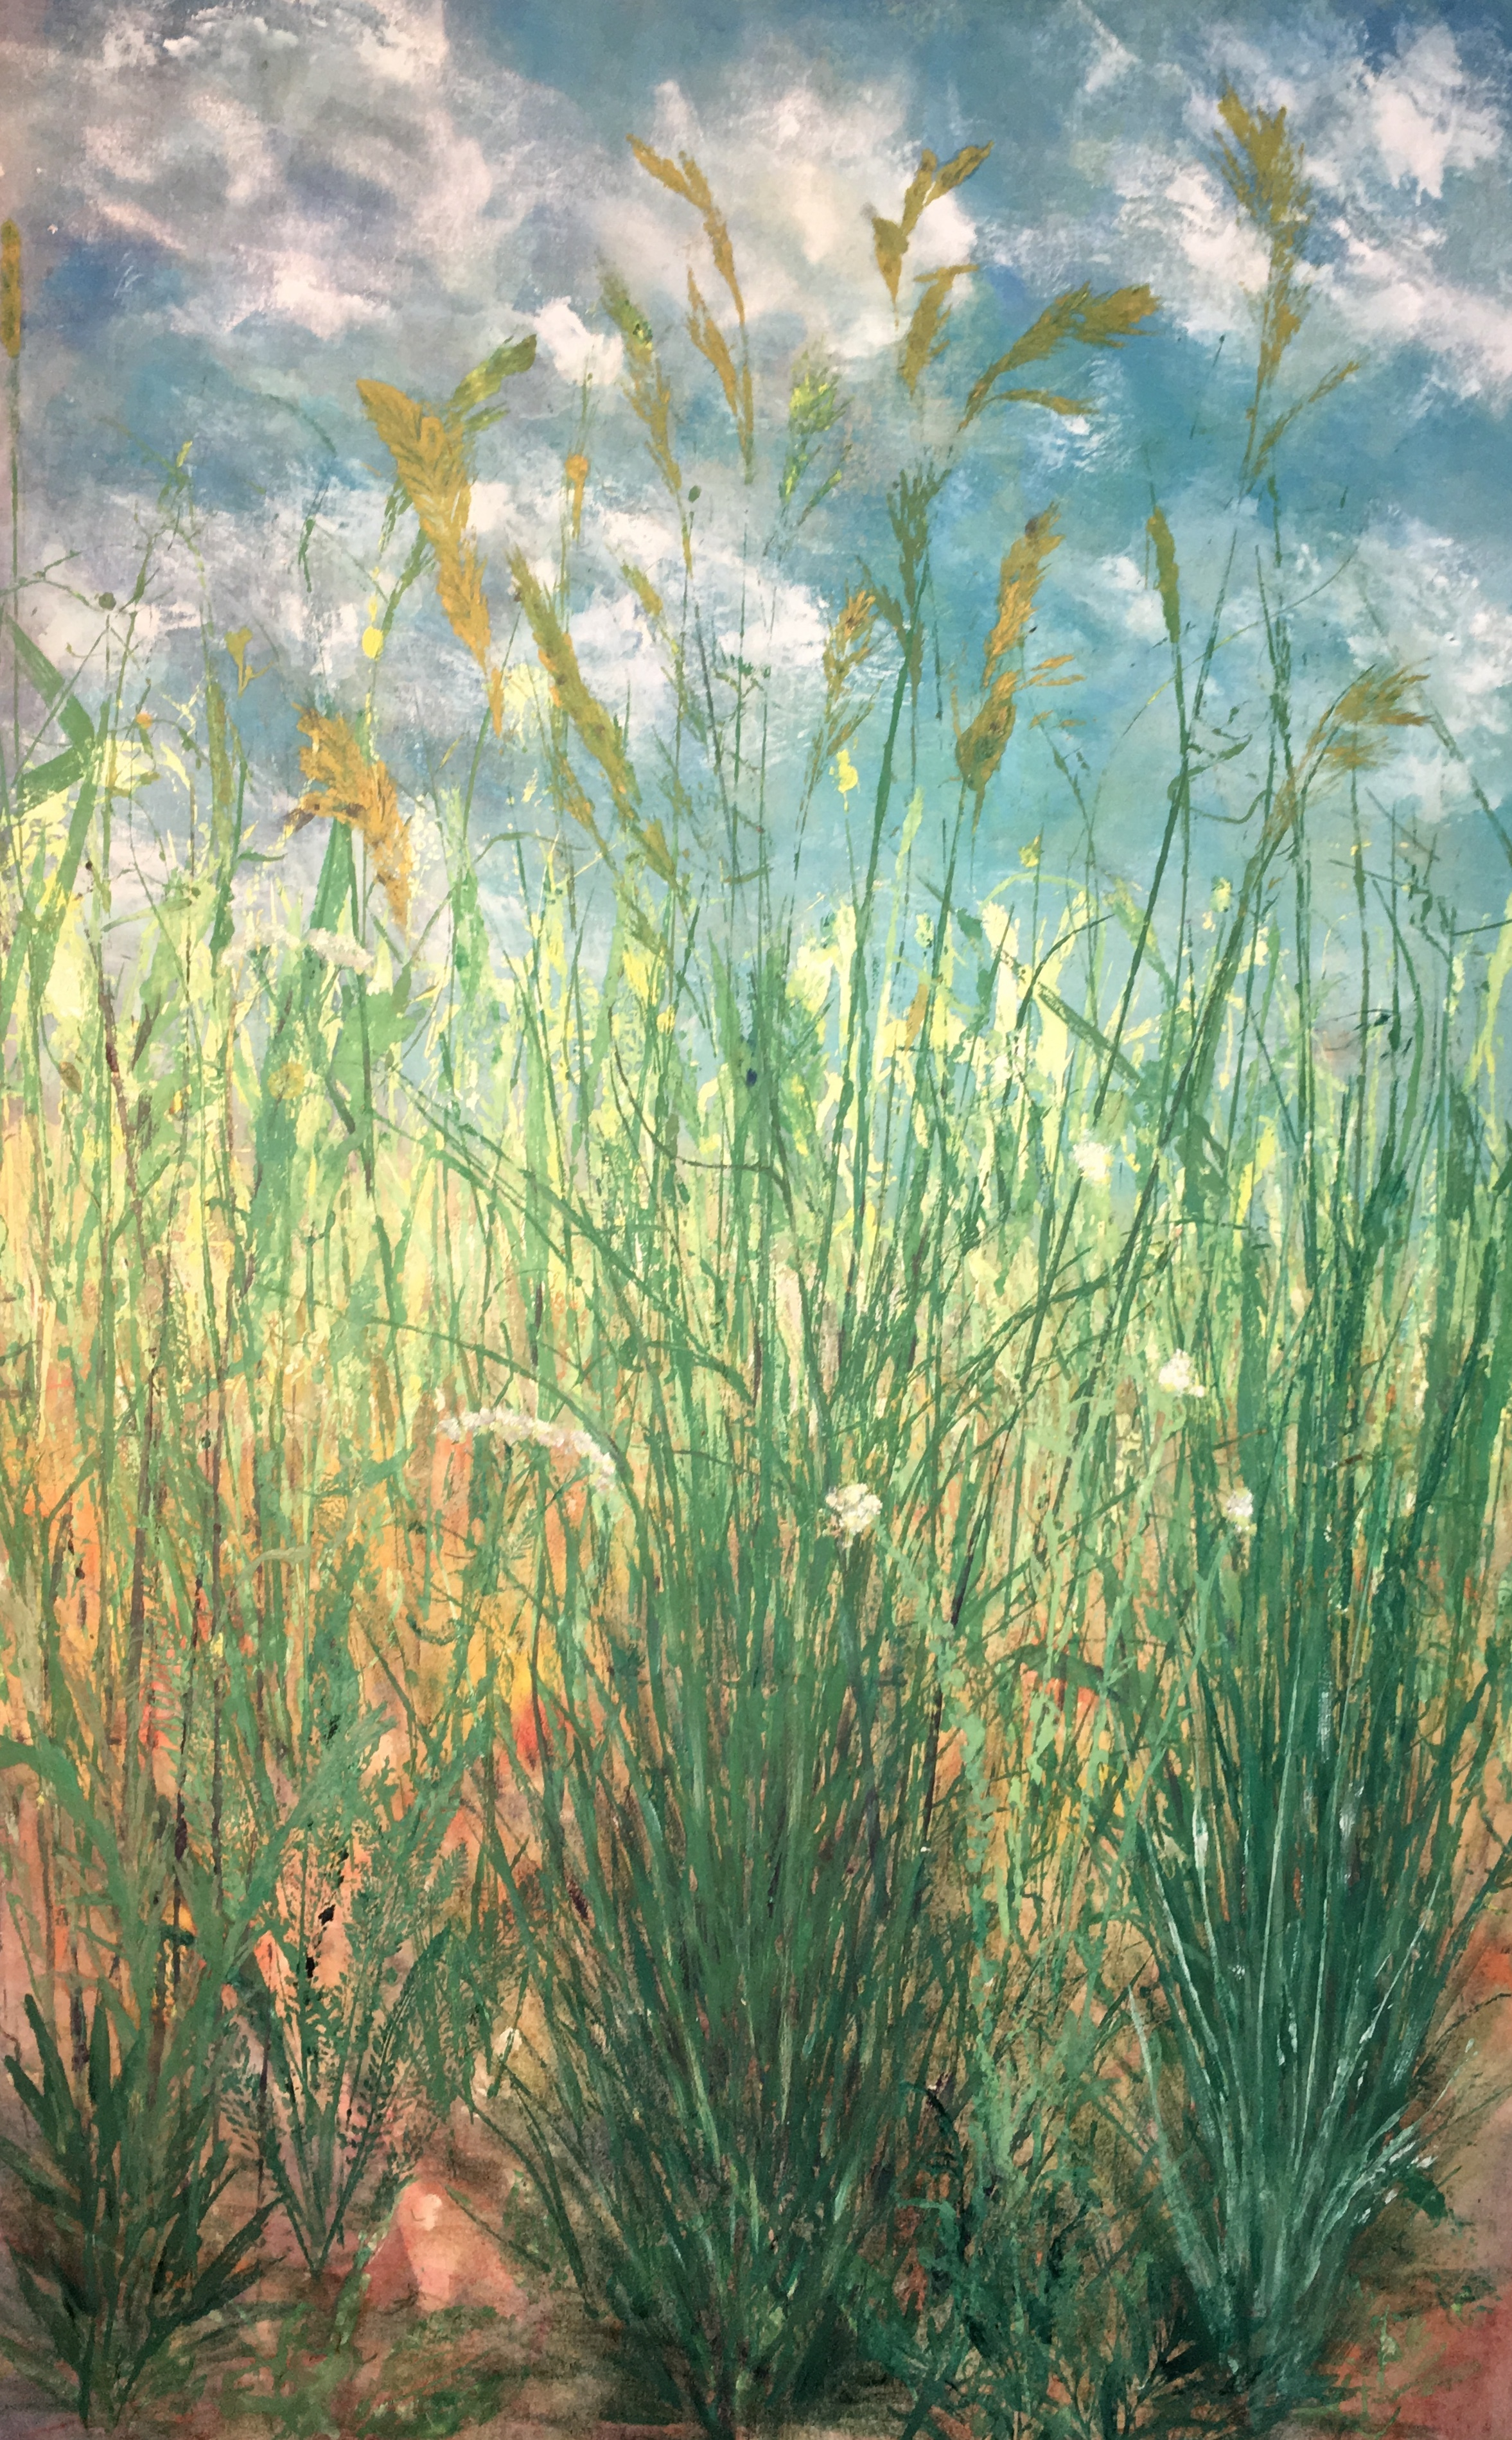 """A Day in July""  ©Linda Snouffer, Botanical Printmaker        Lindasnouffer.com"